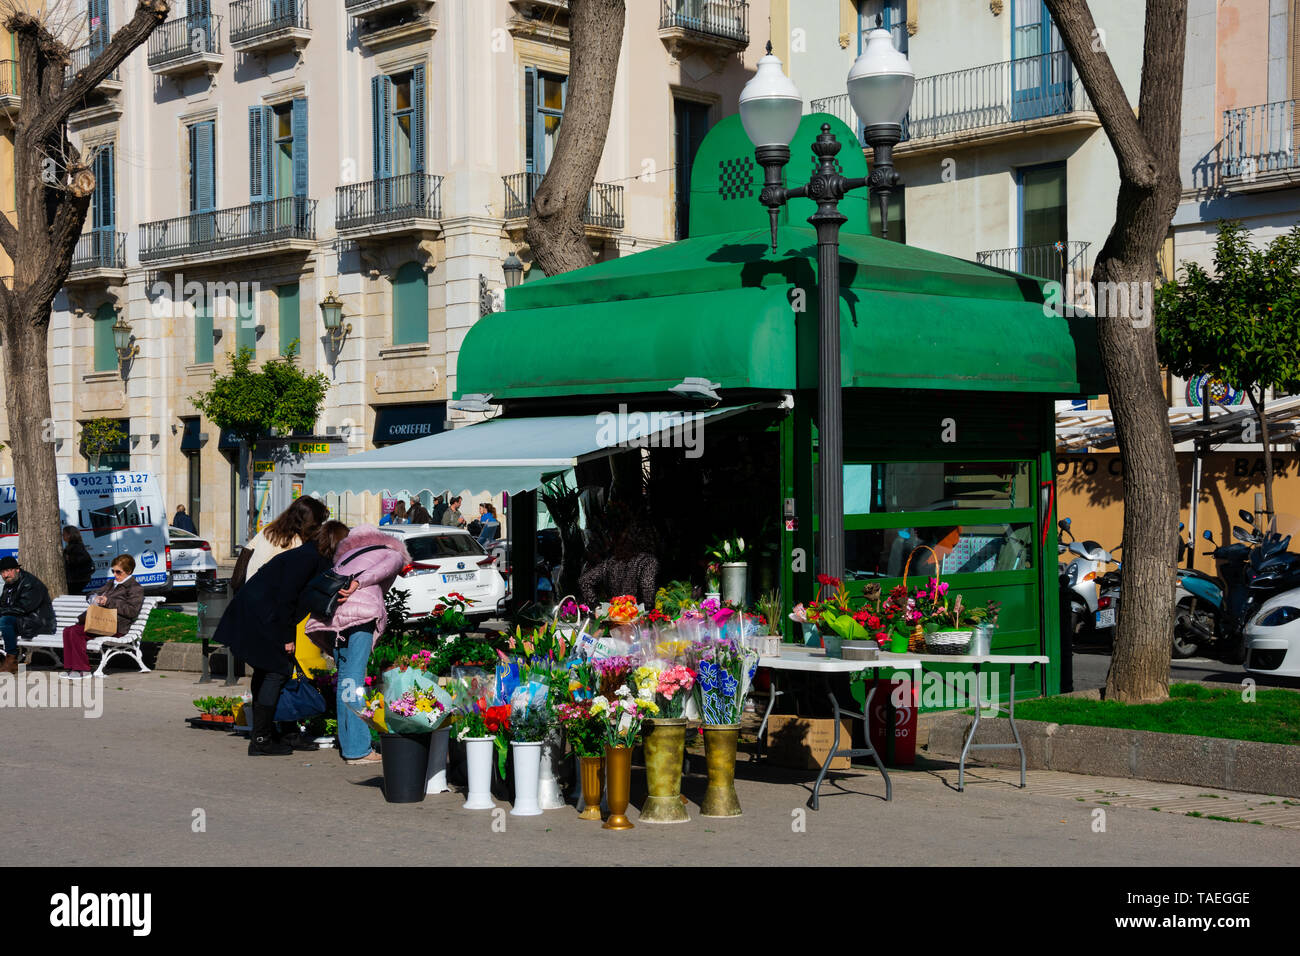 Tarragona, Spain. February 8, 2019. Flower Shop in Rambla Nova, a main city walk with restaurants and shops - Stock Image